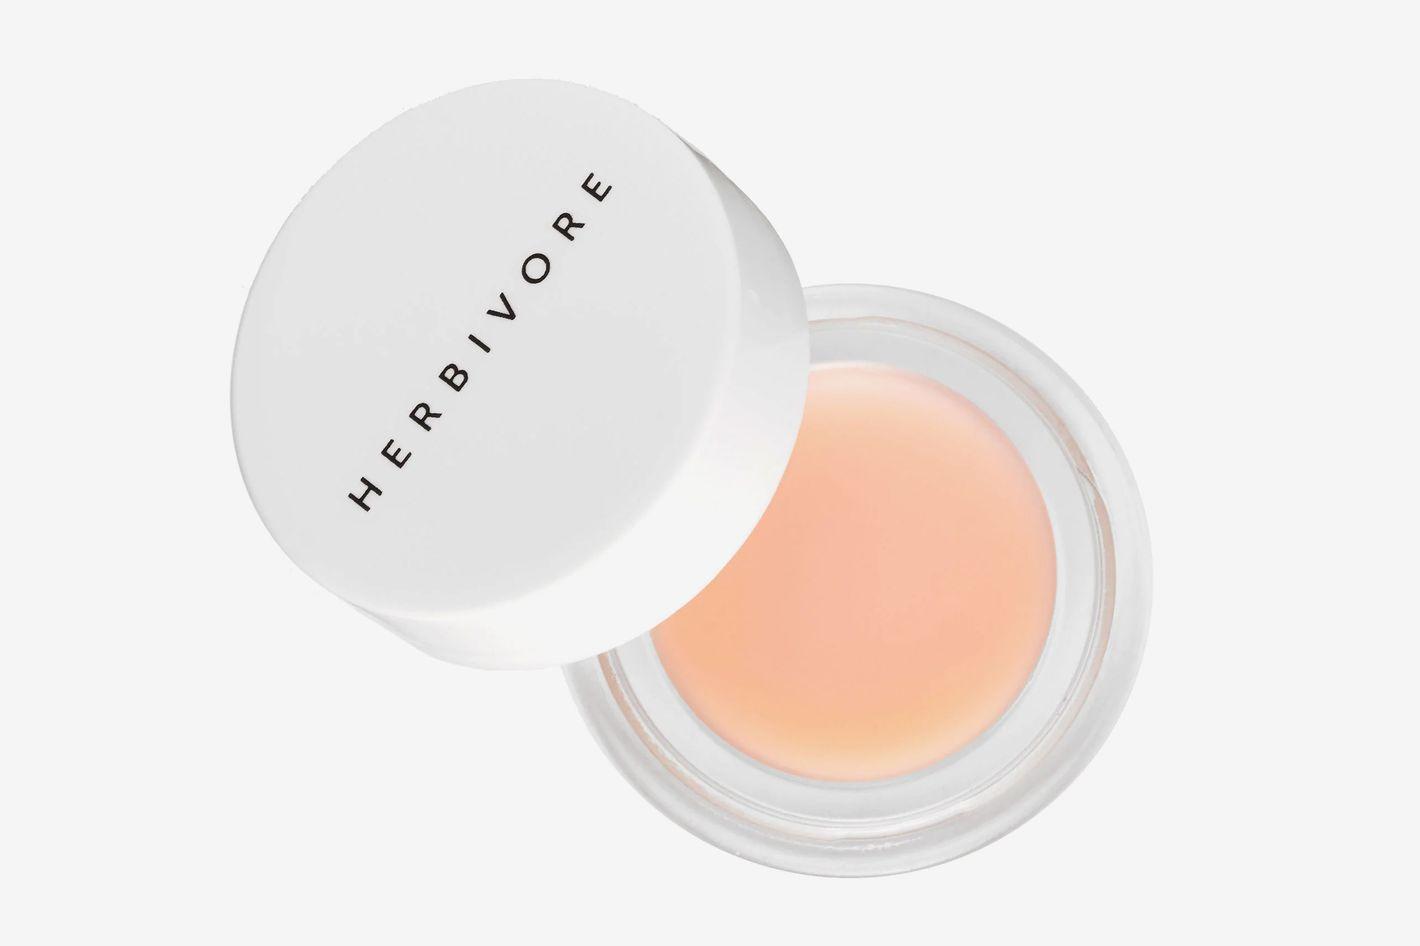 HERBIVORE Coco Rose Coconut Oil Lip Conditioner